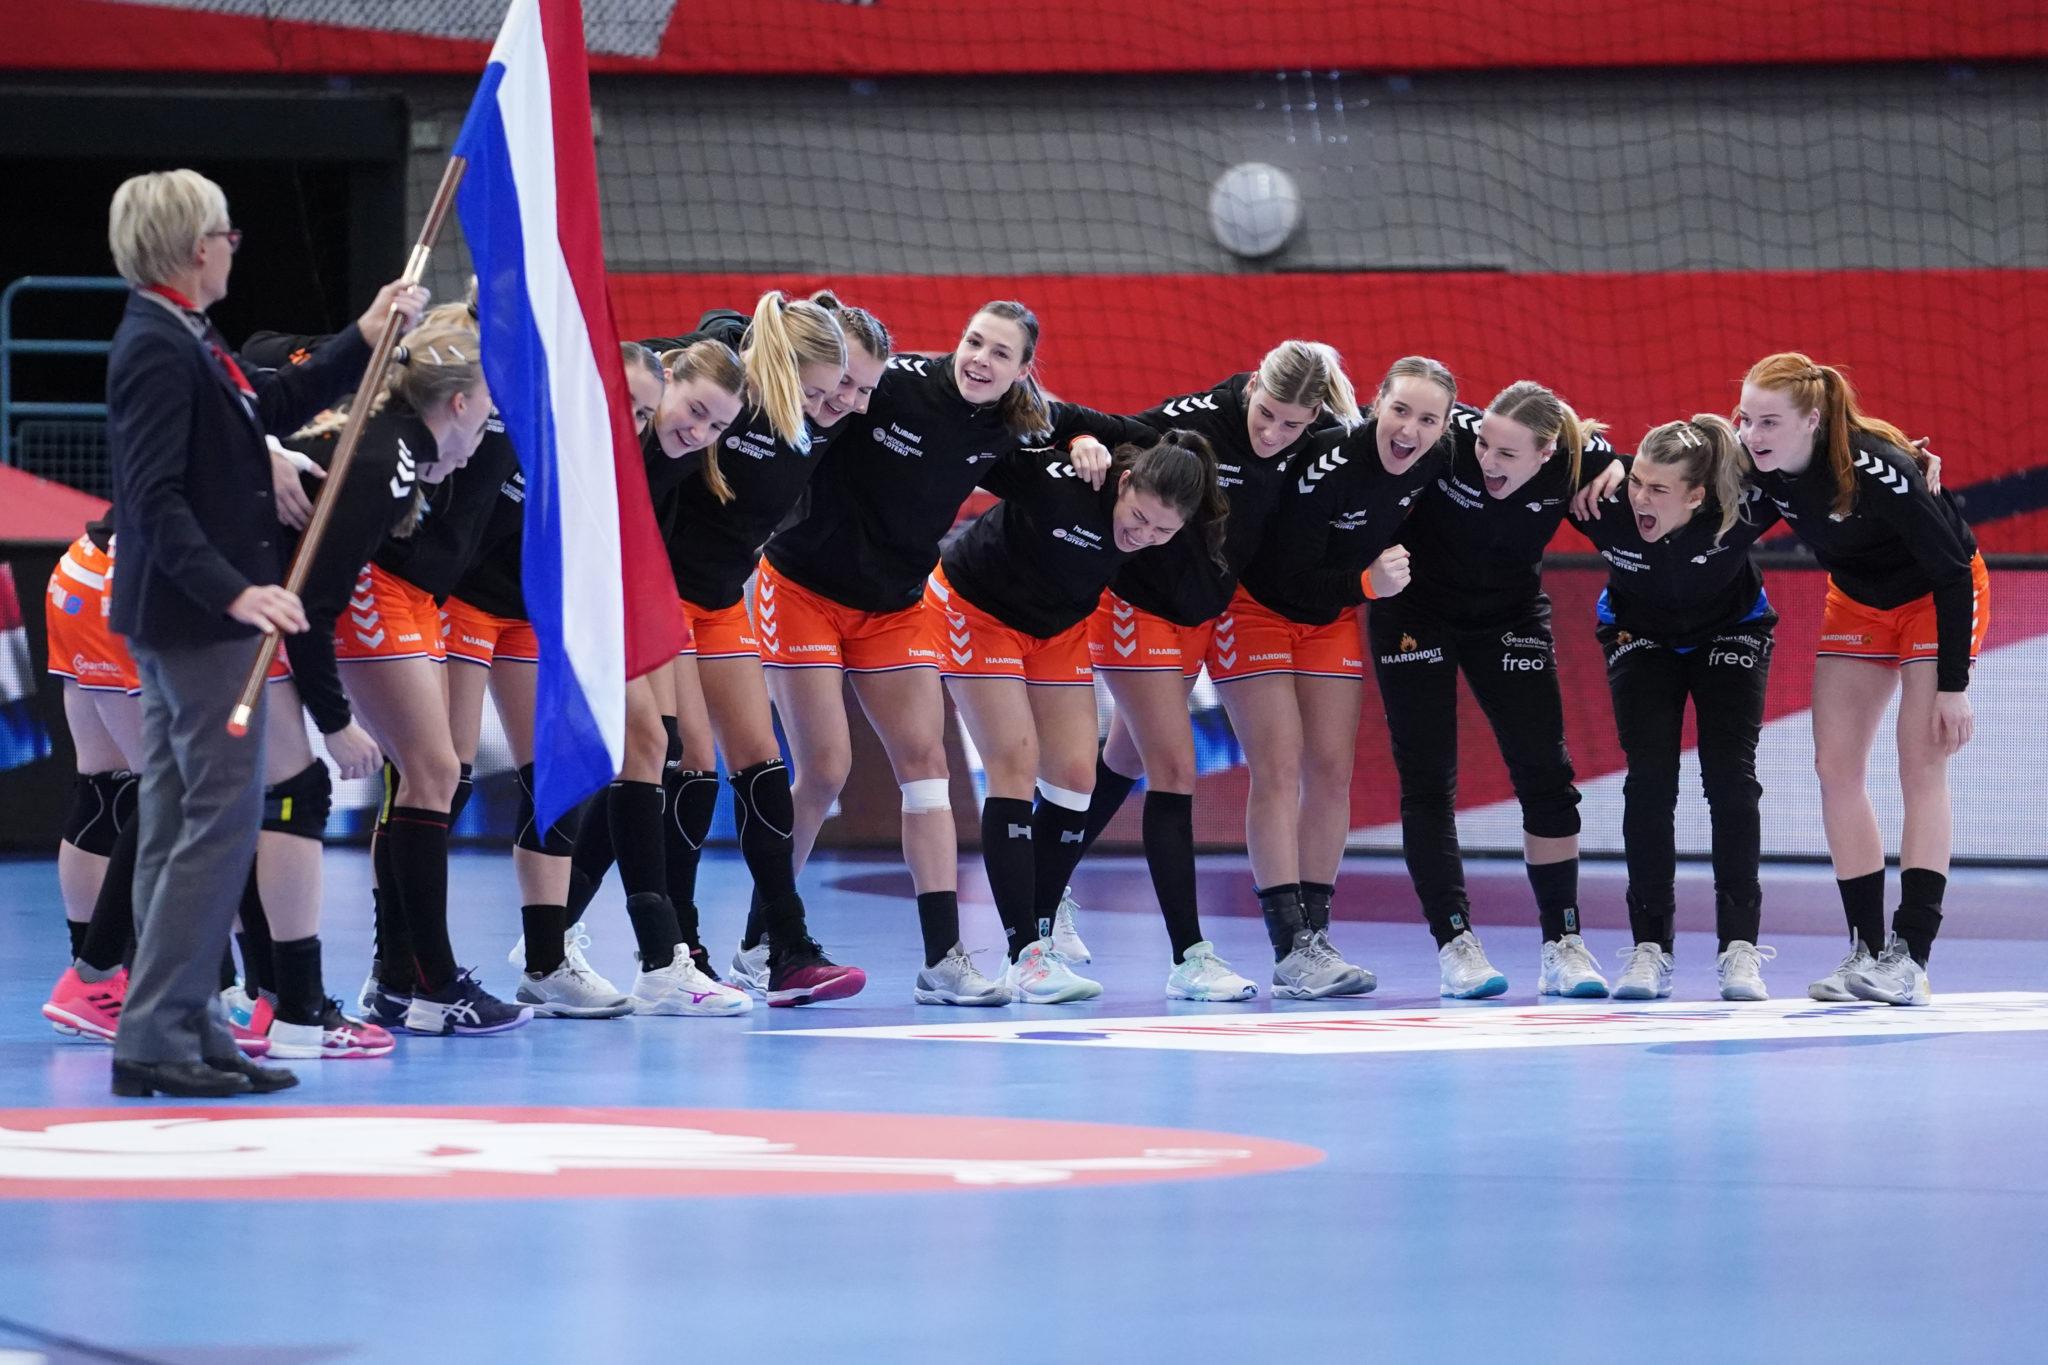 14-12-2020 HANDBAL:NEDERLAND-DUITSLAND:KOLDEN EURO 2020 Dames EK Handbal In Denemarken Nederland - Duitsland Volkslied